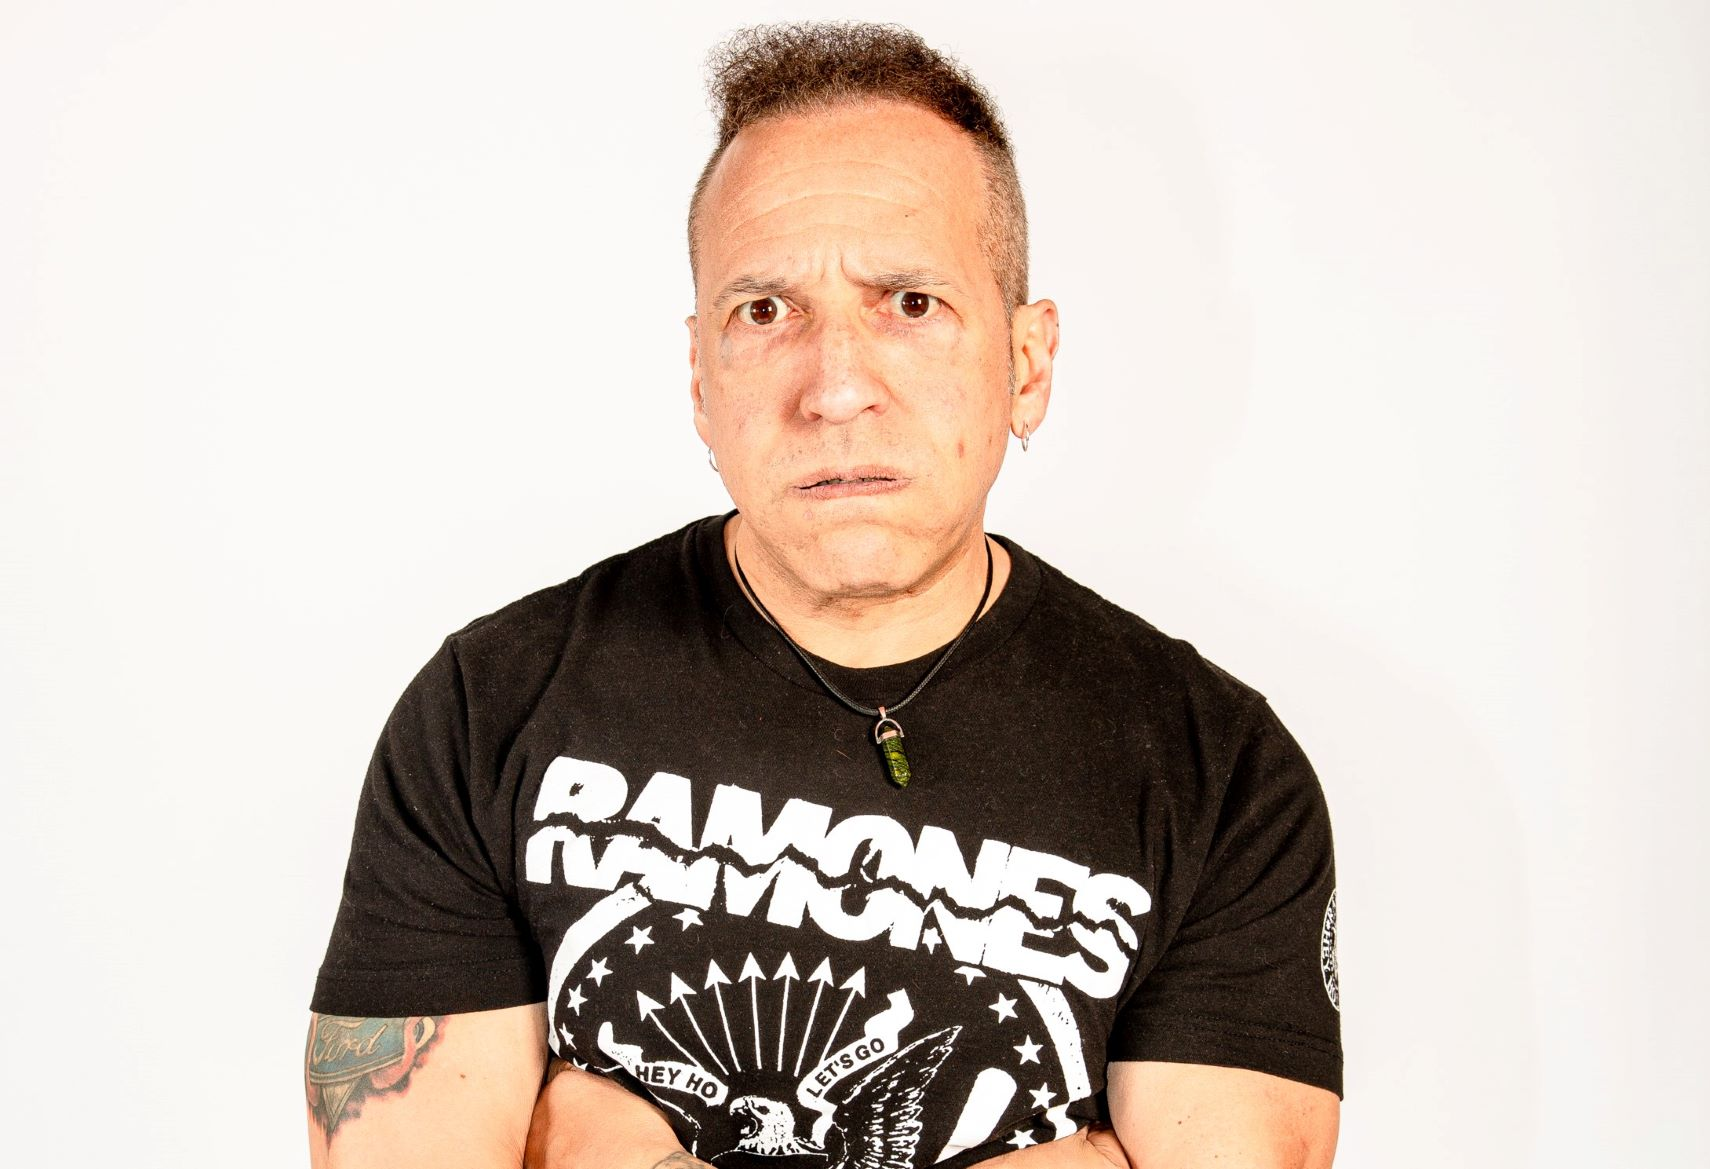 PODCAST – Monday, March 22: AJ's Ailment; Killer Karaoke; Gianni Russo